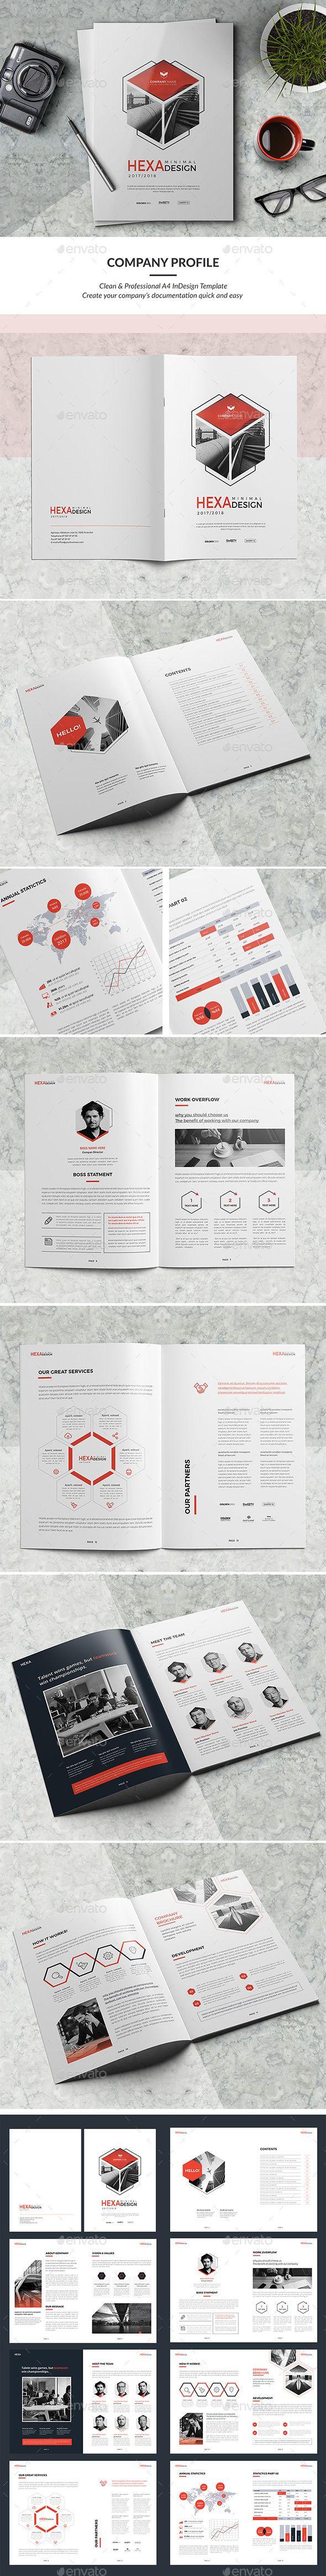 Minimal Company Profile — InDesign INDD #brochure design #creative • Download ➝ https://graphicriver.net/item/minimal-company-profile/19260716?ref=pxcr